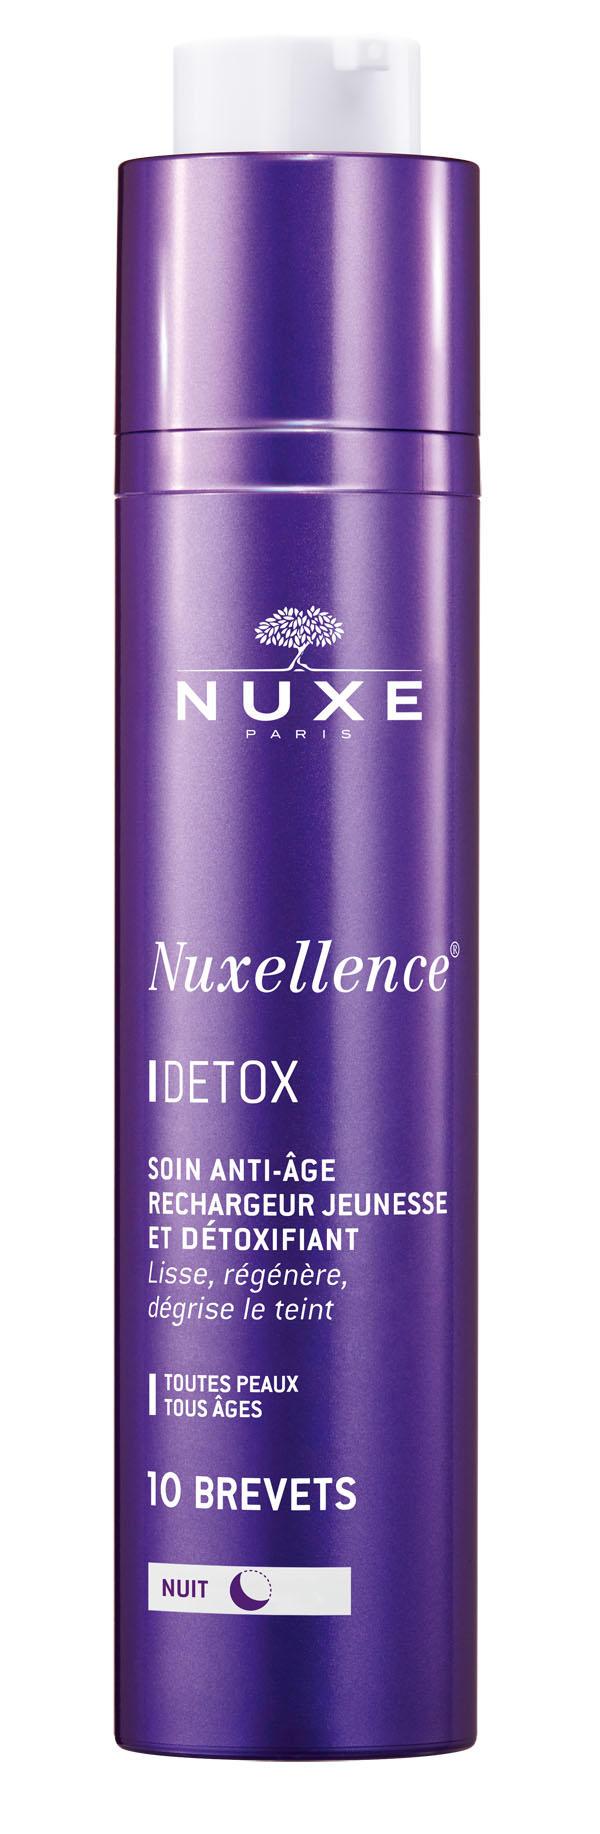 Нюксэлланс Детокс уход против старения 50 мл (Nuxe, Nuxellence) nuxe нюксэлланс детокс уход против старения